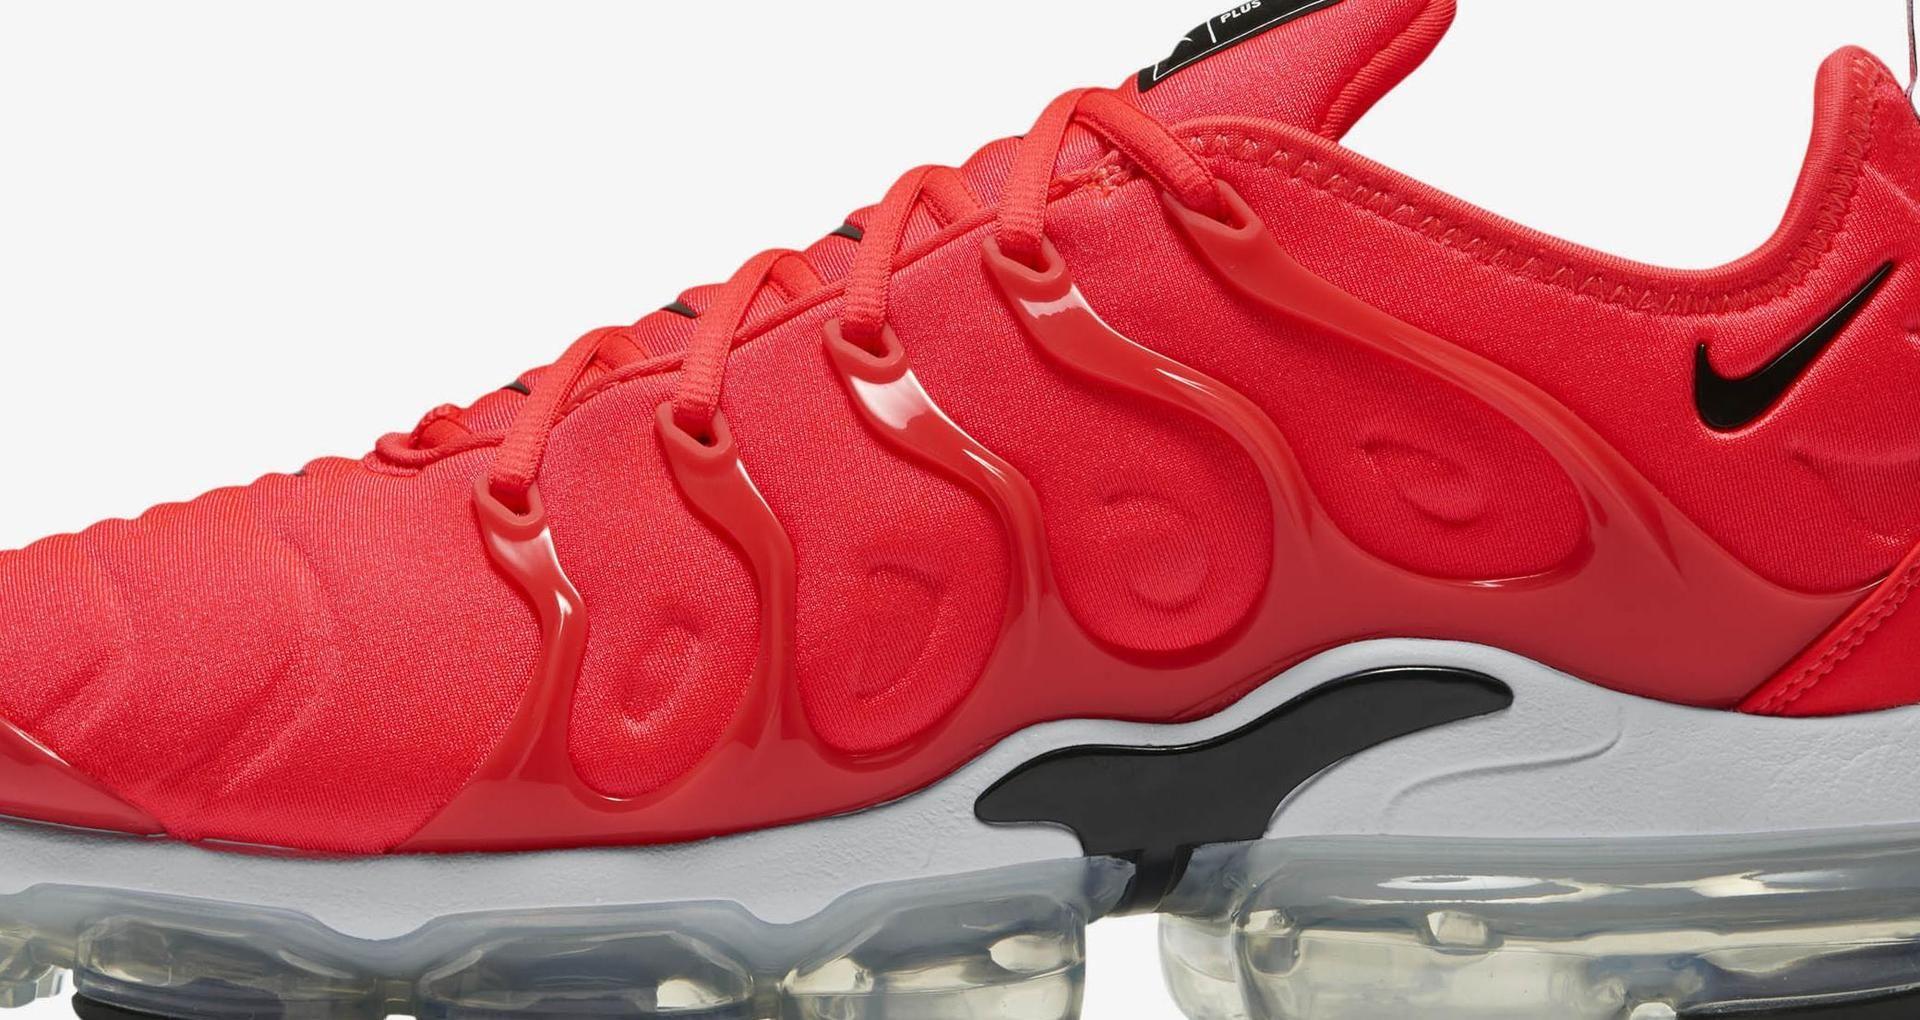 87123563caef Nike Air Vapormax Plus  Bright Crimson   White   Black  Release Date ...